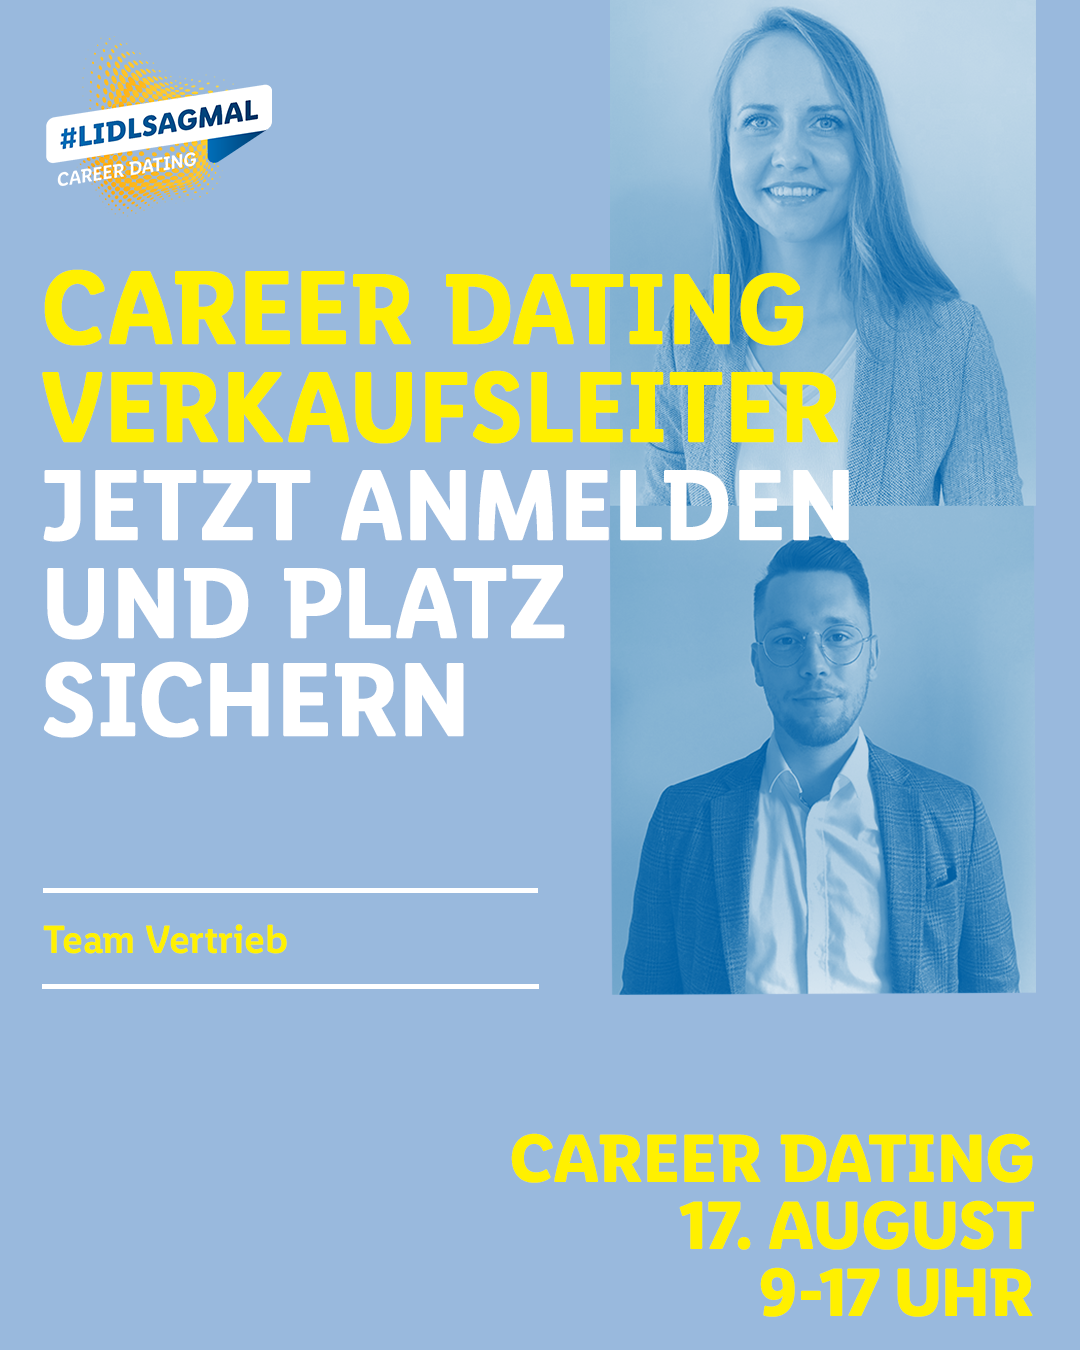 Lidl Career Dating Verkaufsleiter 17. August 2021